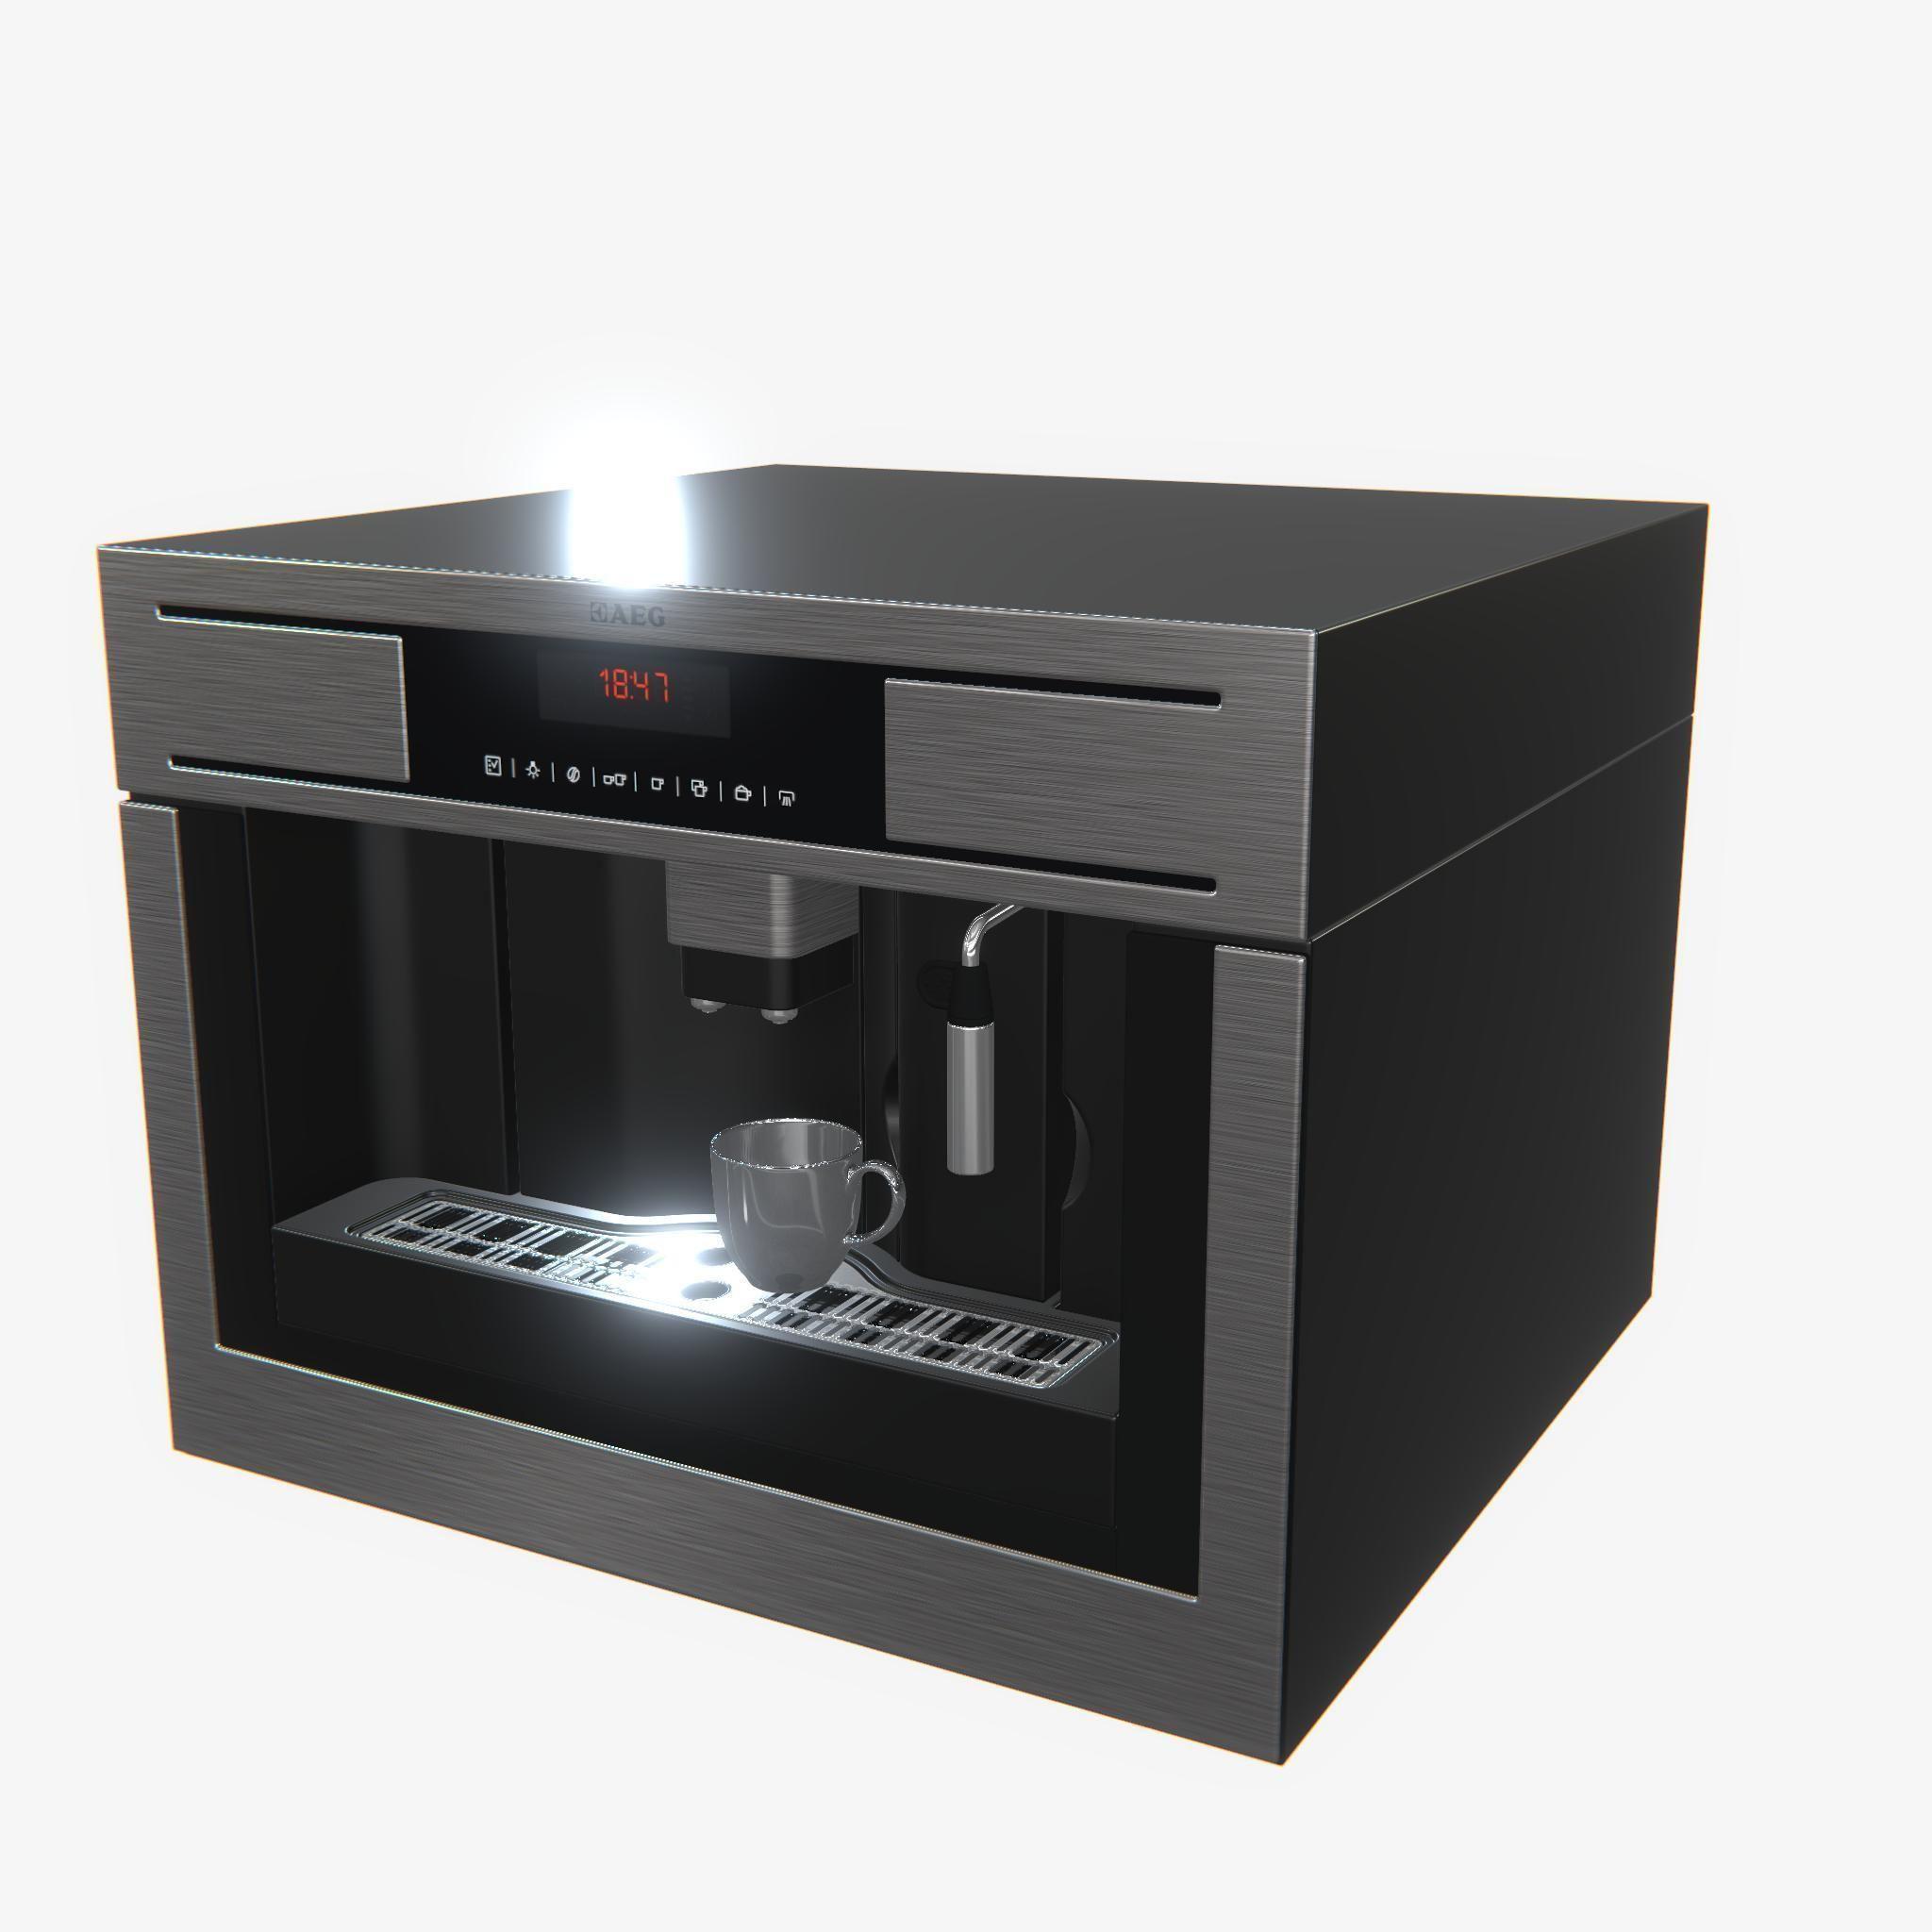 Highly detailed coffee machine aeg pbr 3d model aeg